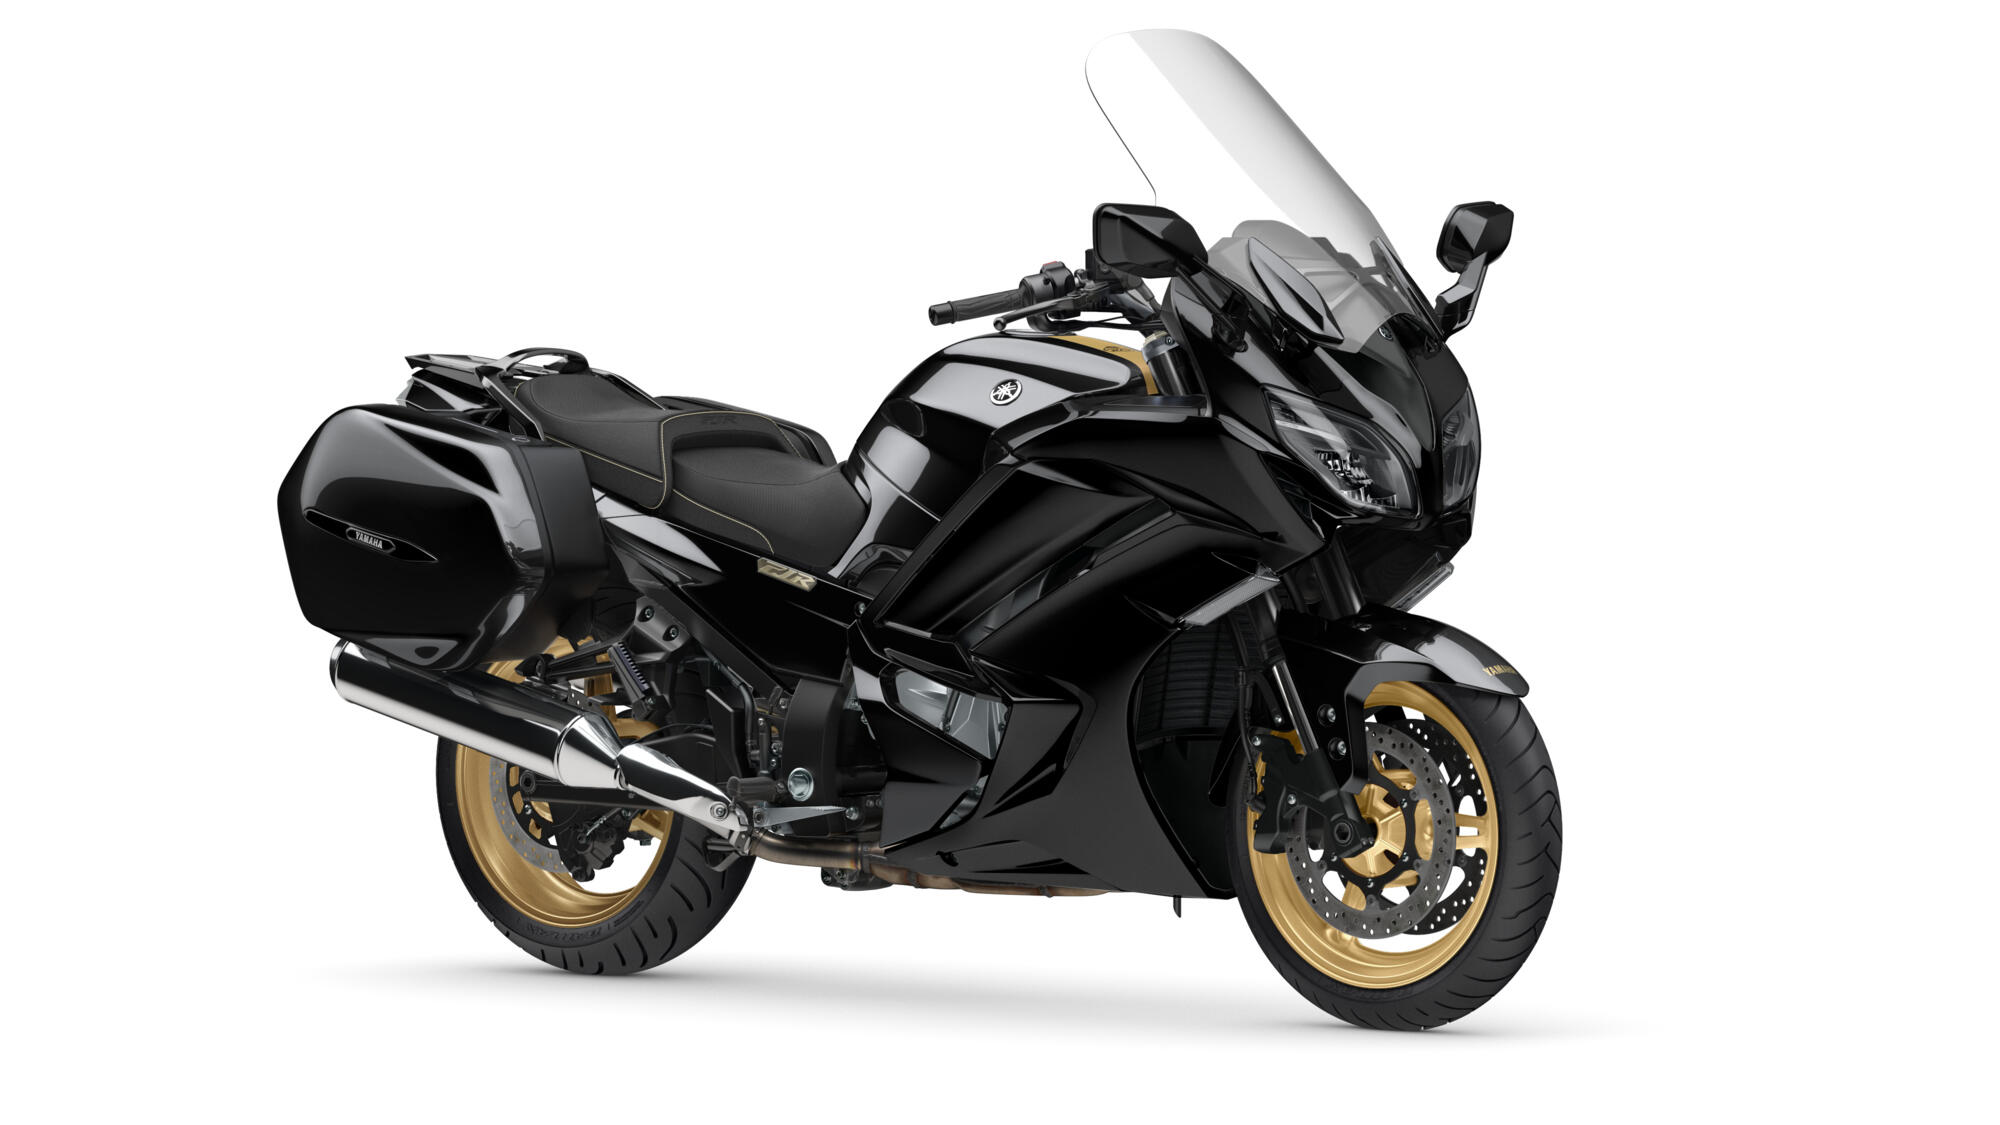 2020-Yamaha-FJR1300AESPL-EU-Midnight_Black-Studio-001-03